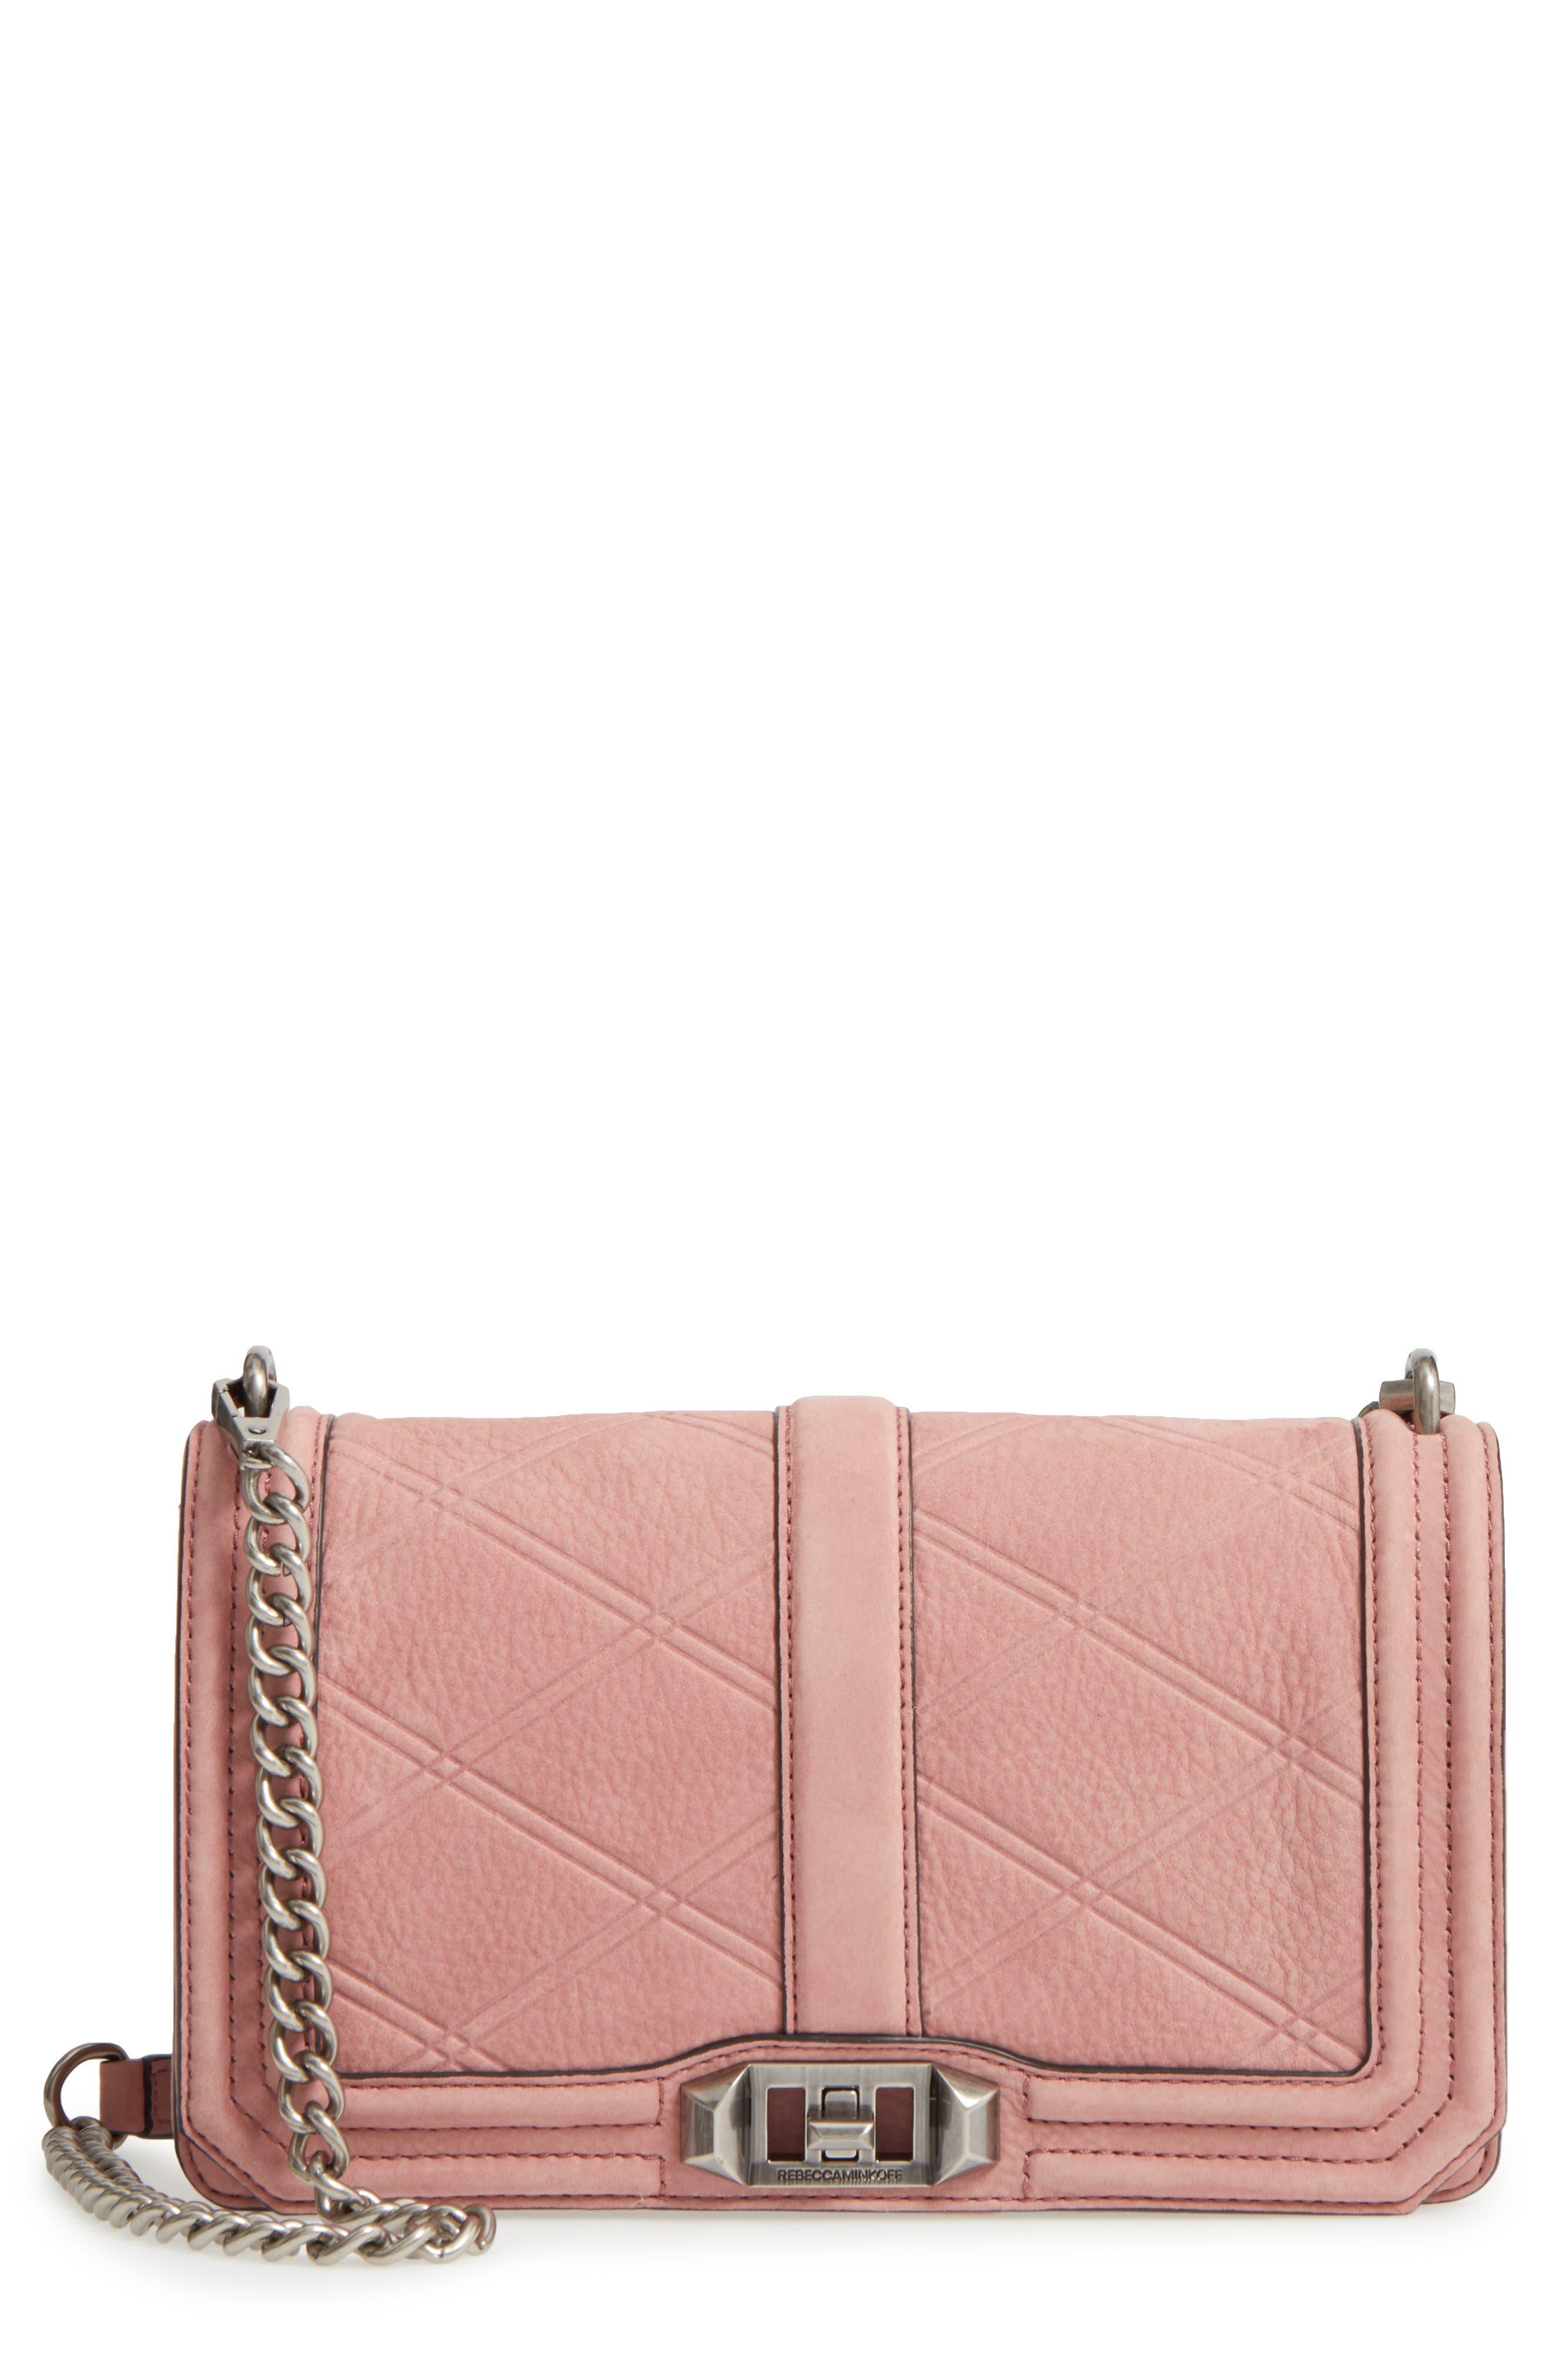 Rebecca Minkoff Love Nubuck Crossbody Bag